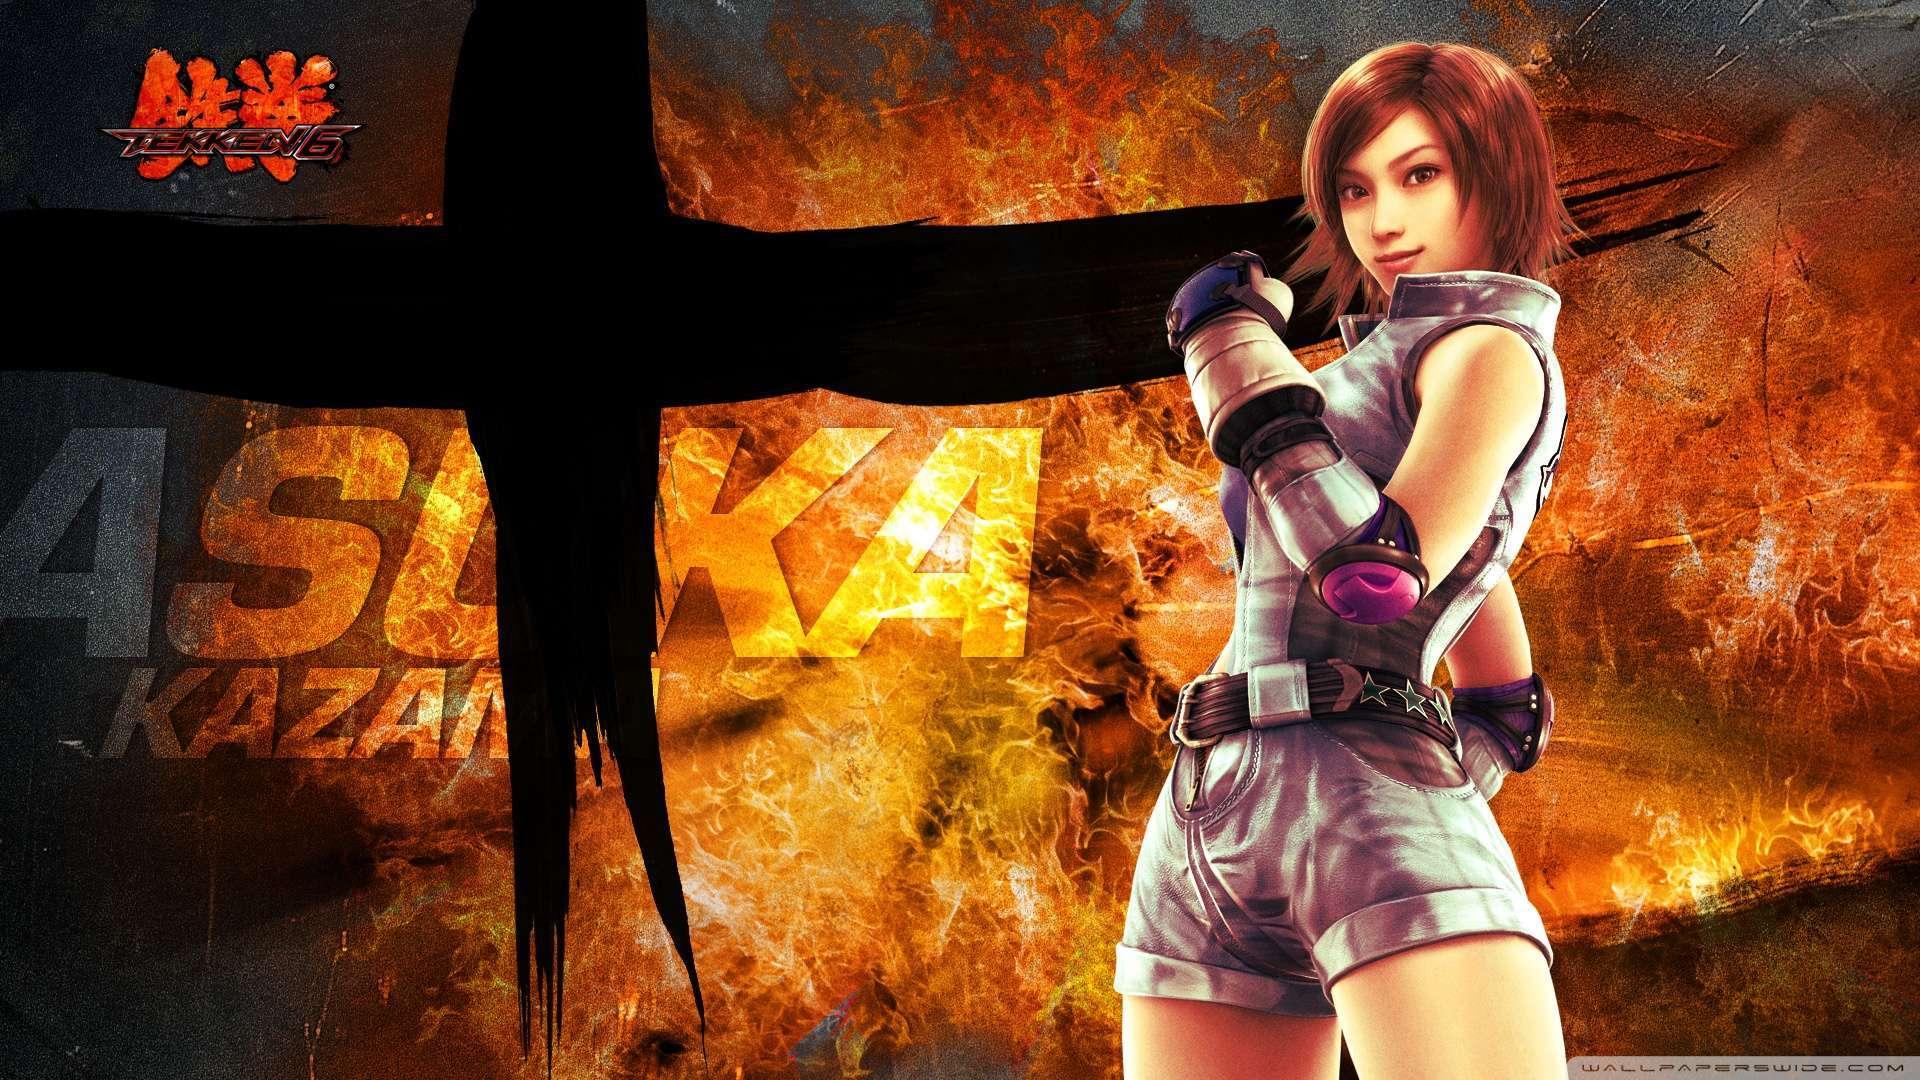 Wallpaper Tekken 7 Wallpaper 1080p HD Upload at February 19 2014 by 1920x1080